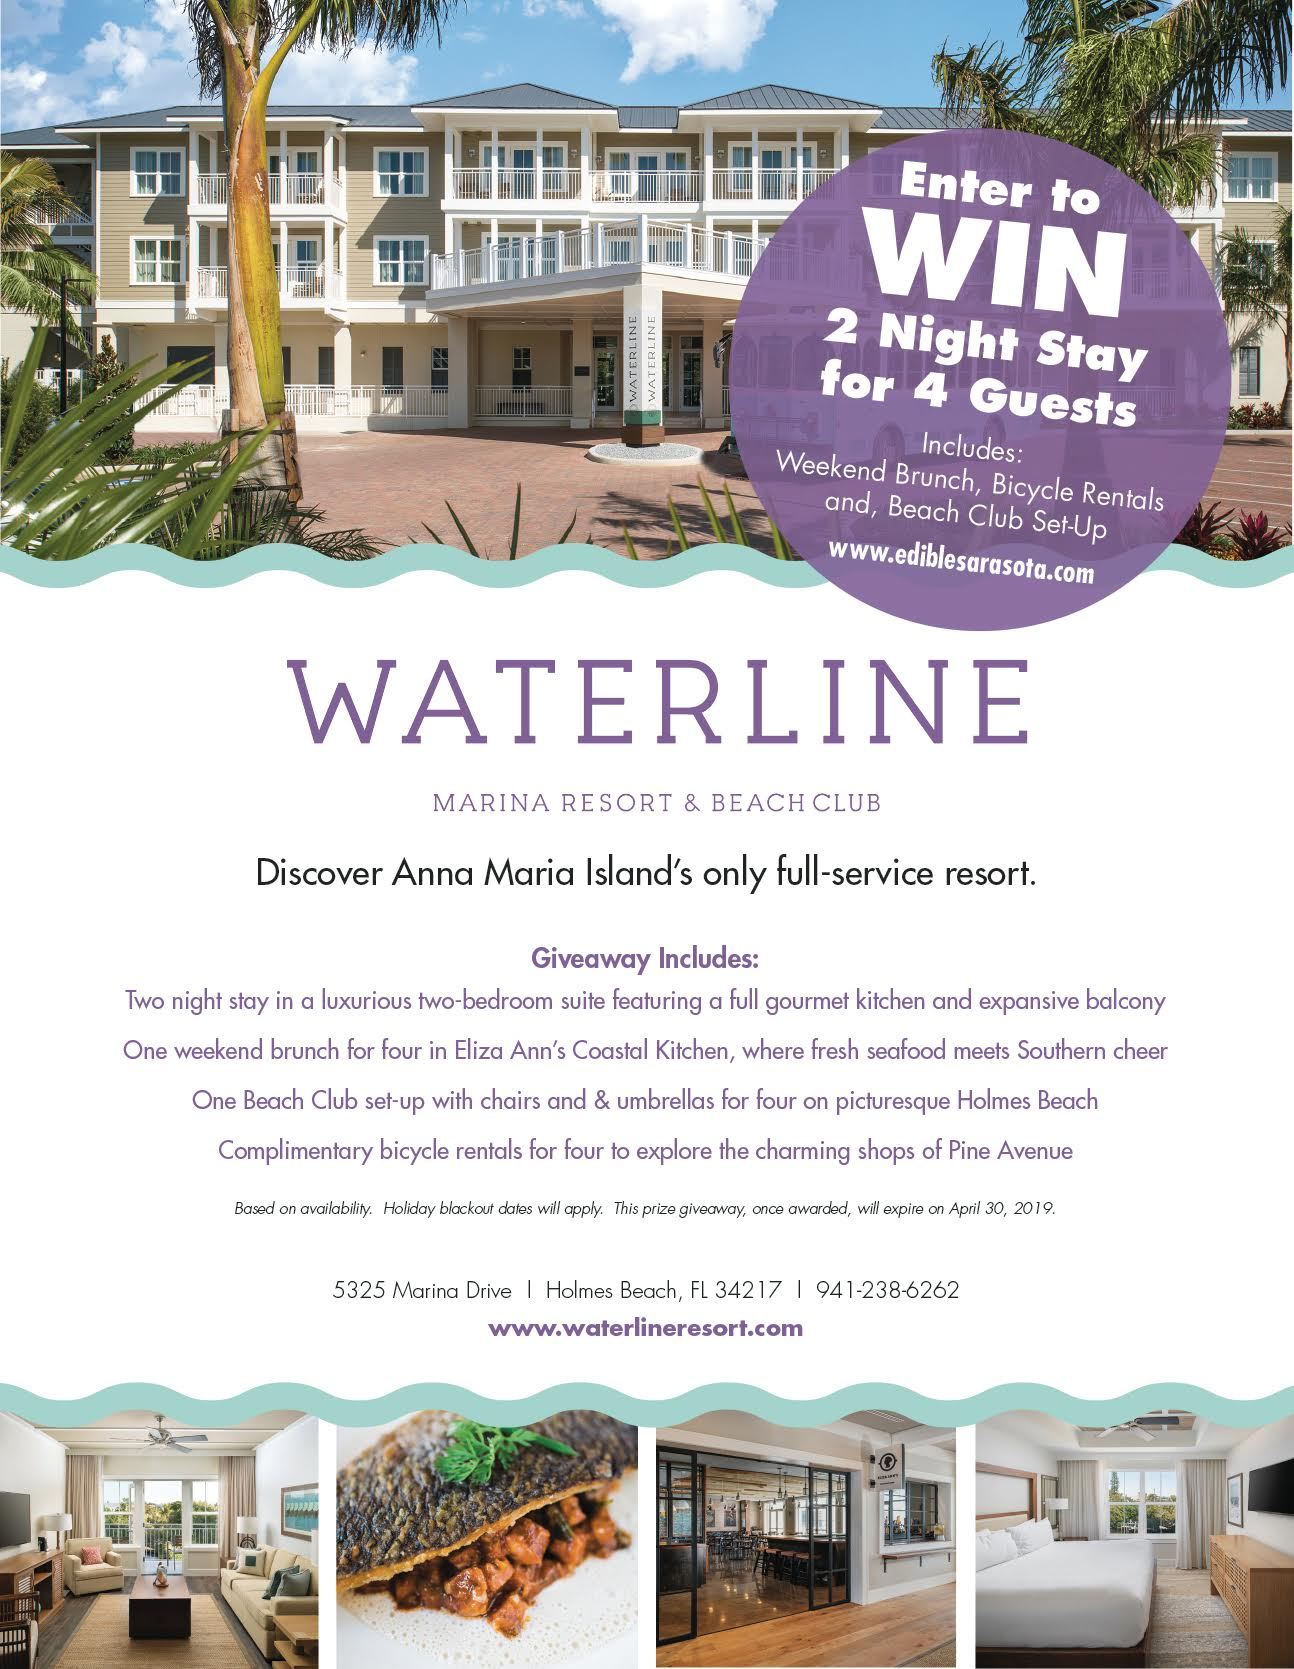 Waterline Marina Resort & Beach Club Giveaway   Edible Sarasota